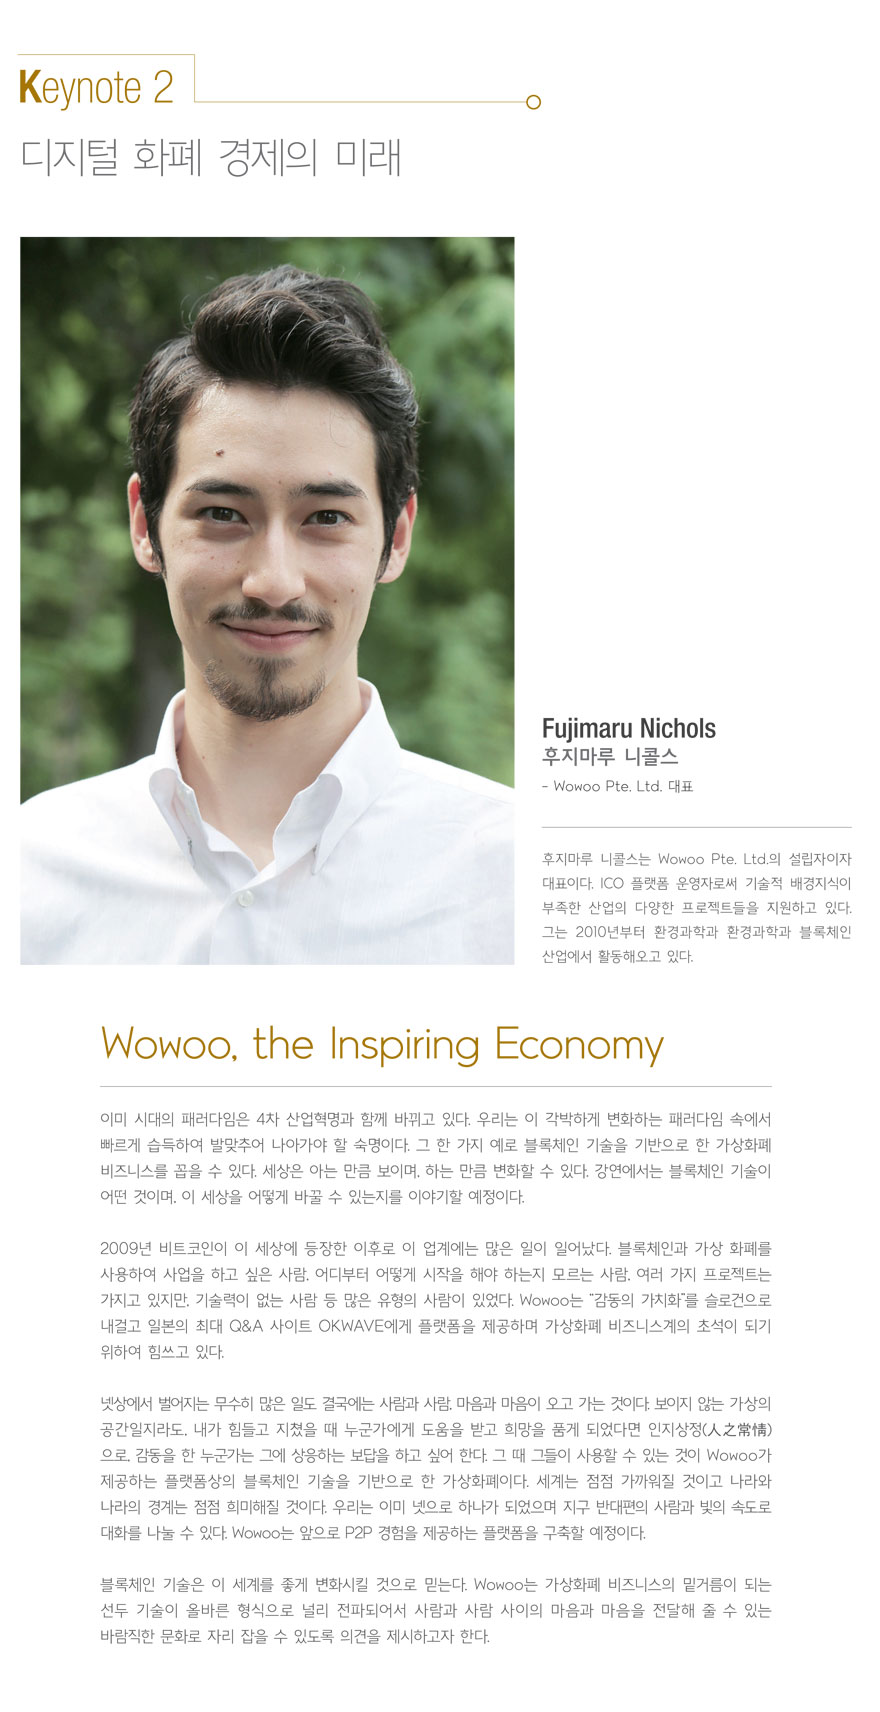 Keynote2:디지털 화폐 경제의 미래, 후지마루 니콜스